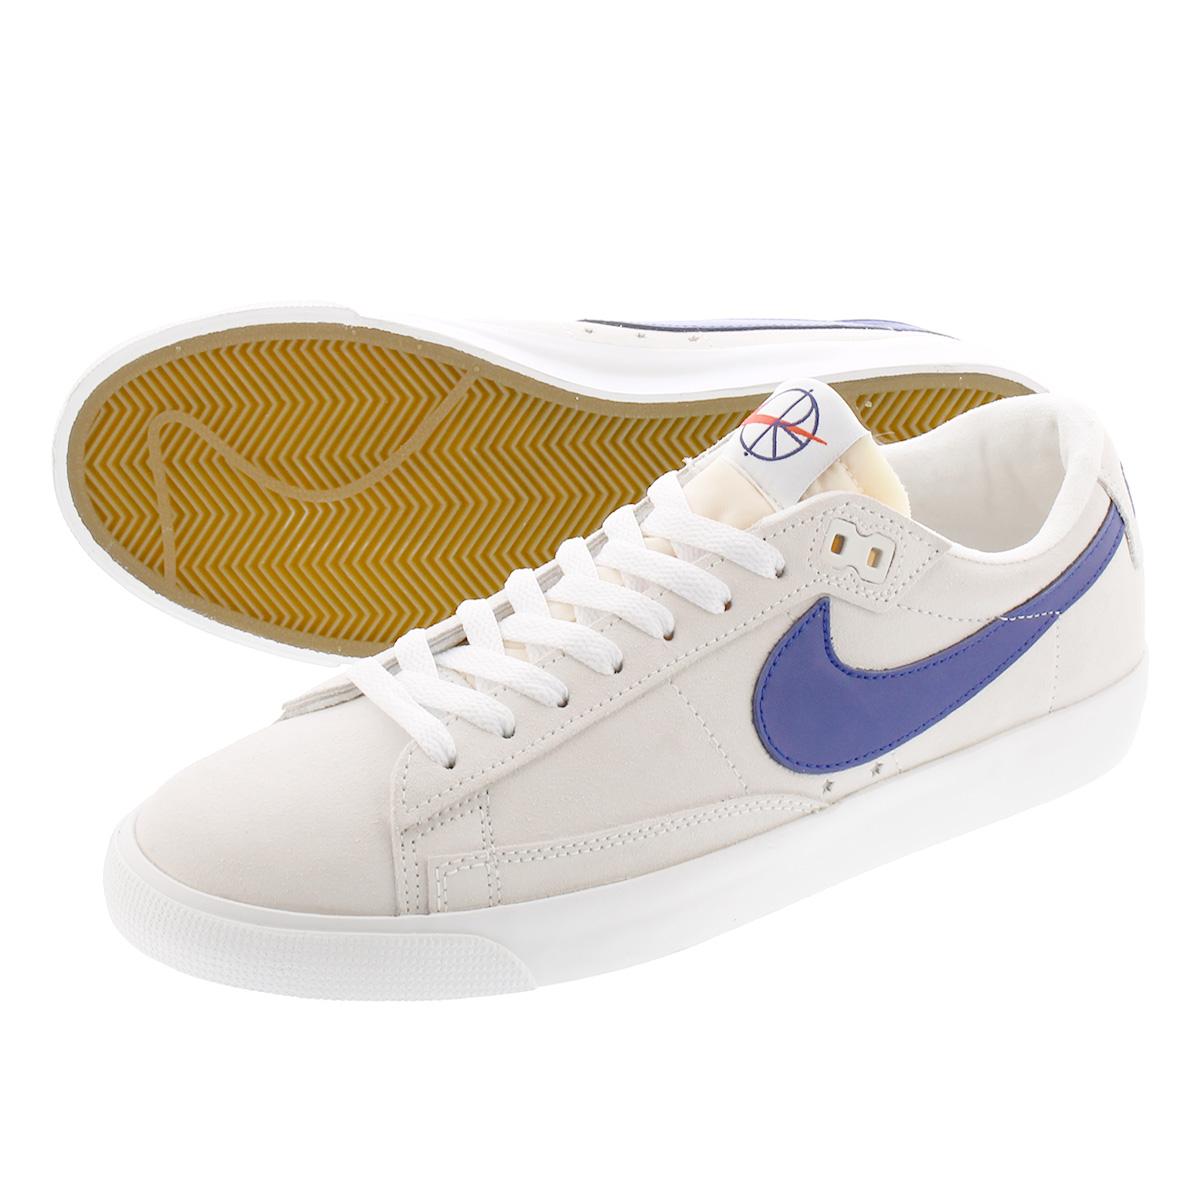 POLAR x NIKE SB ZOOM BLAZER LOW GT QS polar x Nike SB zoom blazer low GT QS  SUMMIT WHITE/DEEP ROYAL BLUE av3028-100